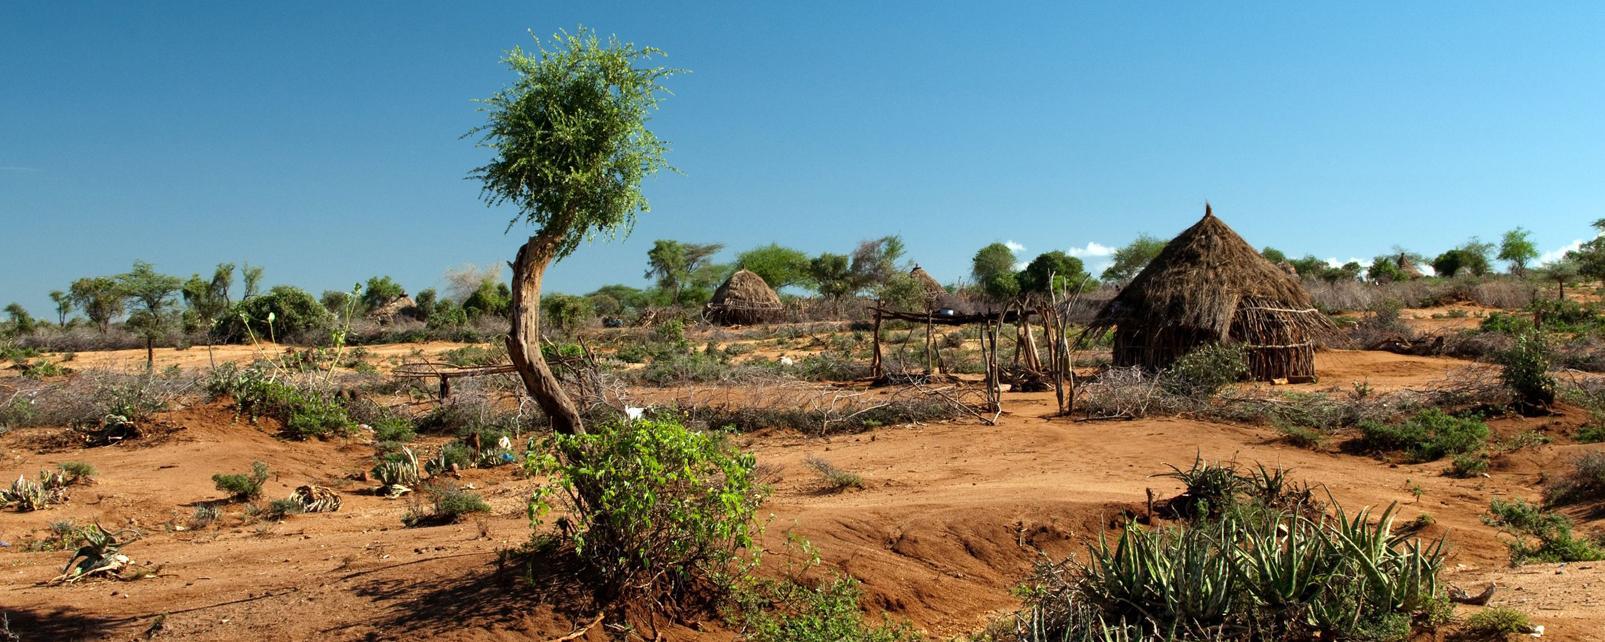 Site de rencontre guinee conakry